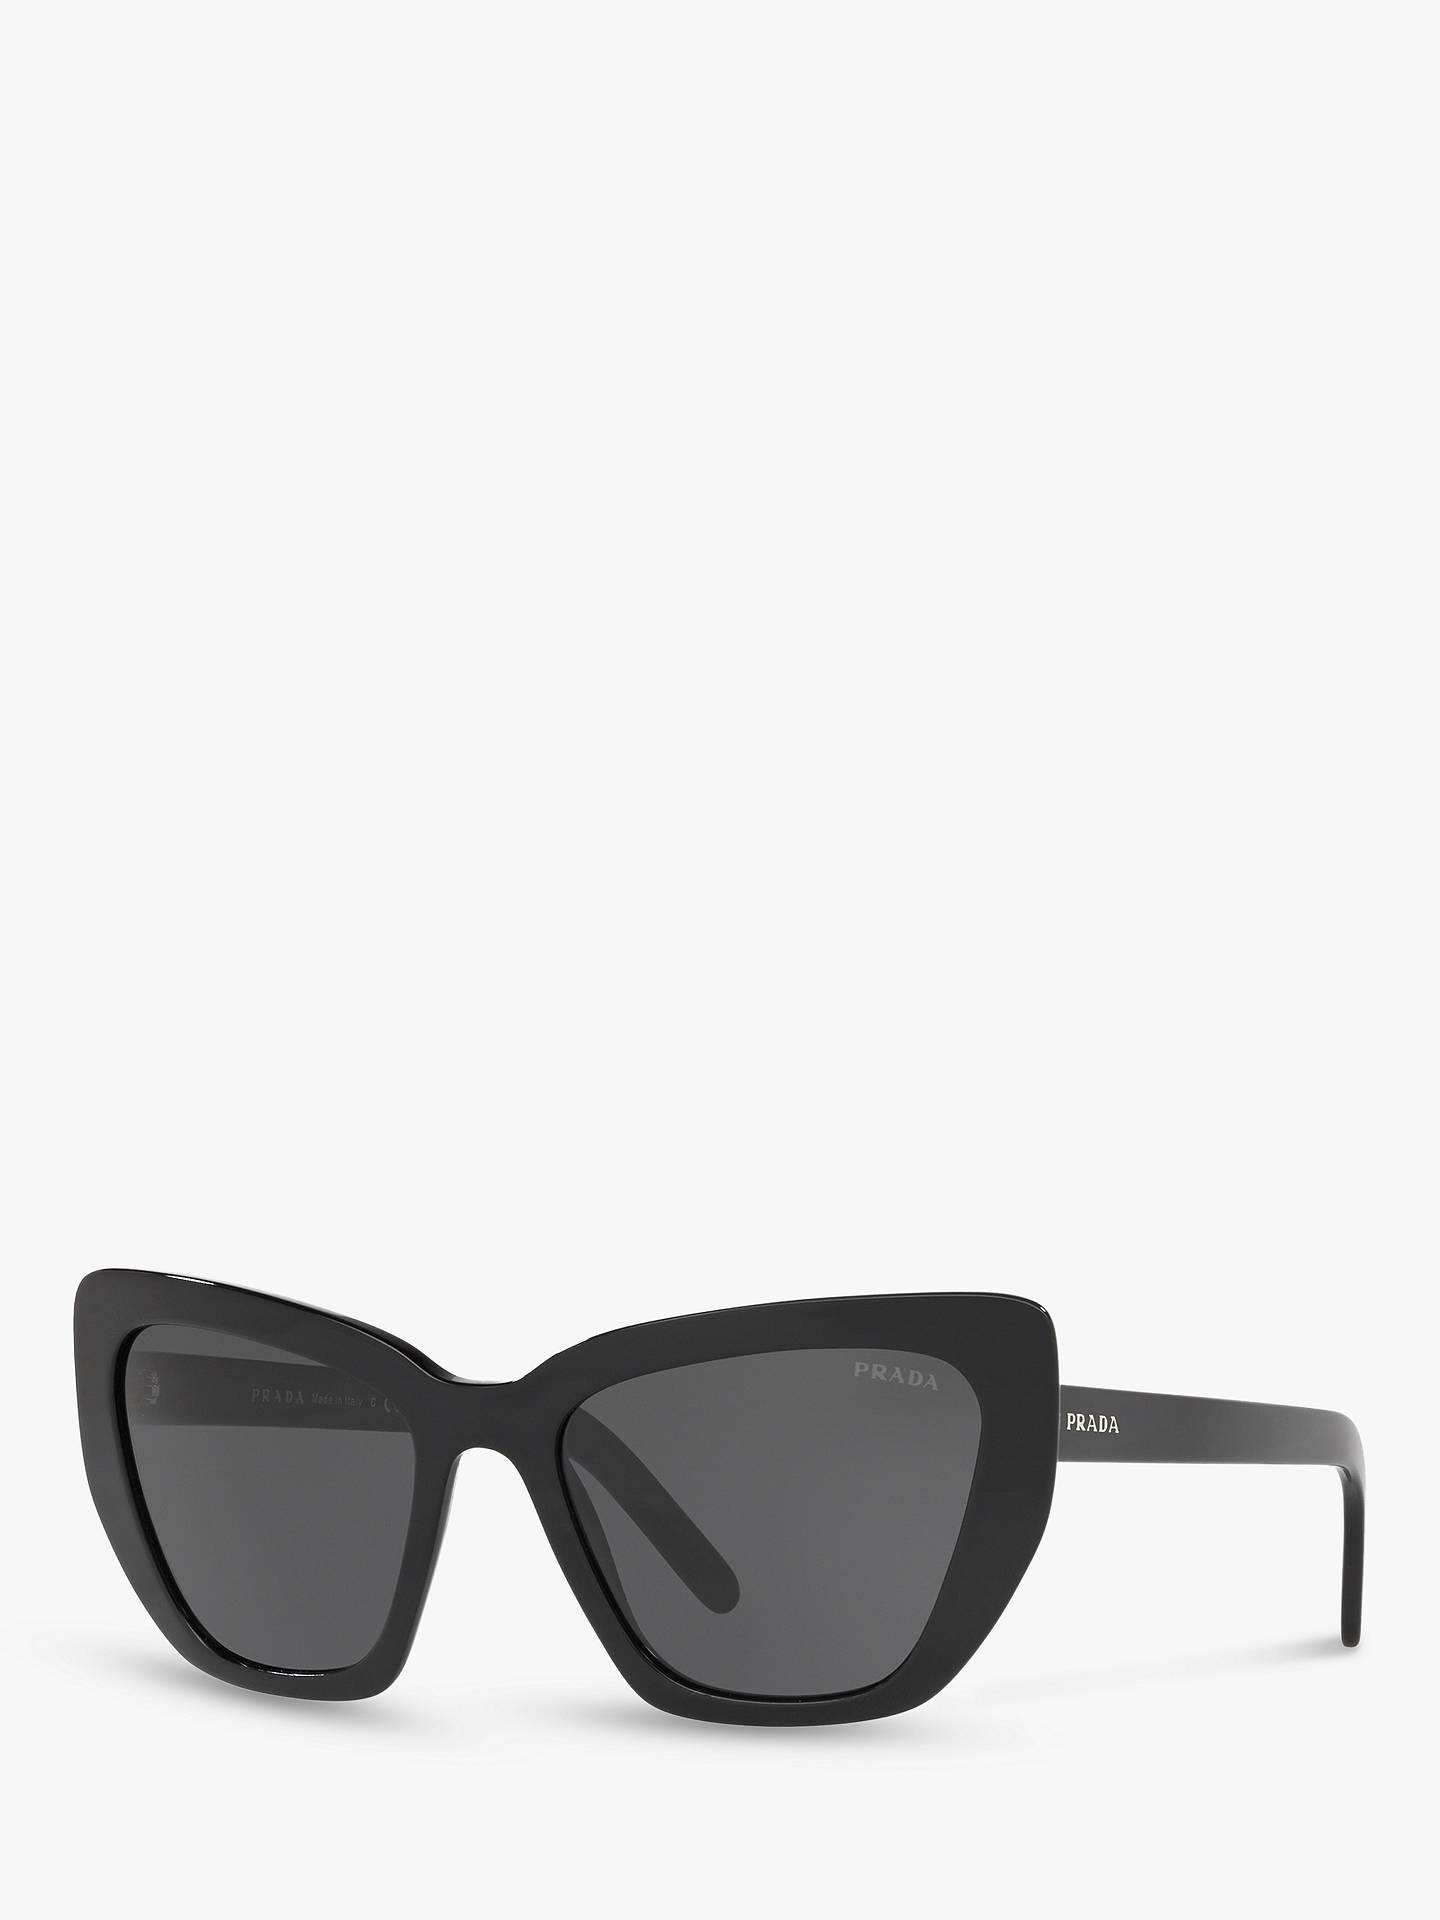 12a4d0cf0901 Prada PR 08VS Women s Cat s Eye Sunglasses at John Lewis   Partners